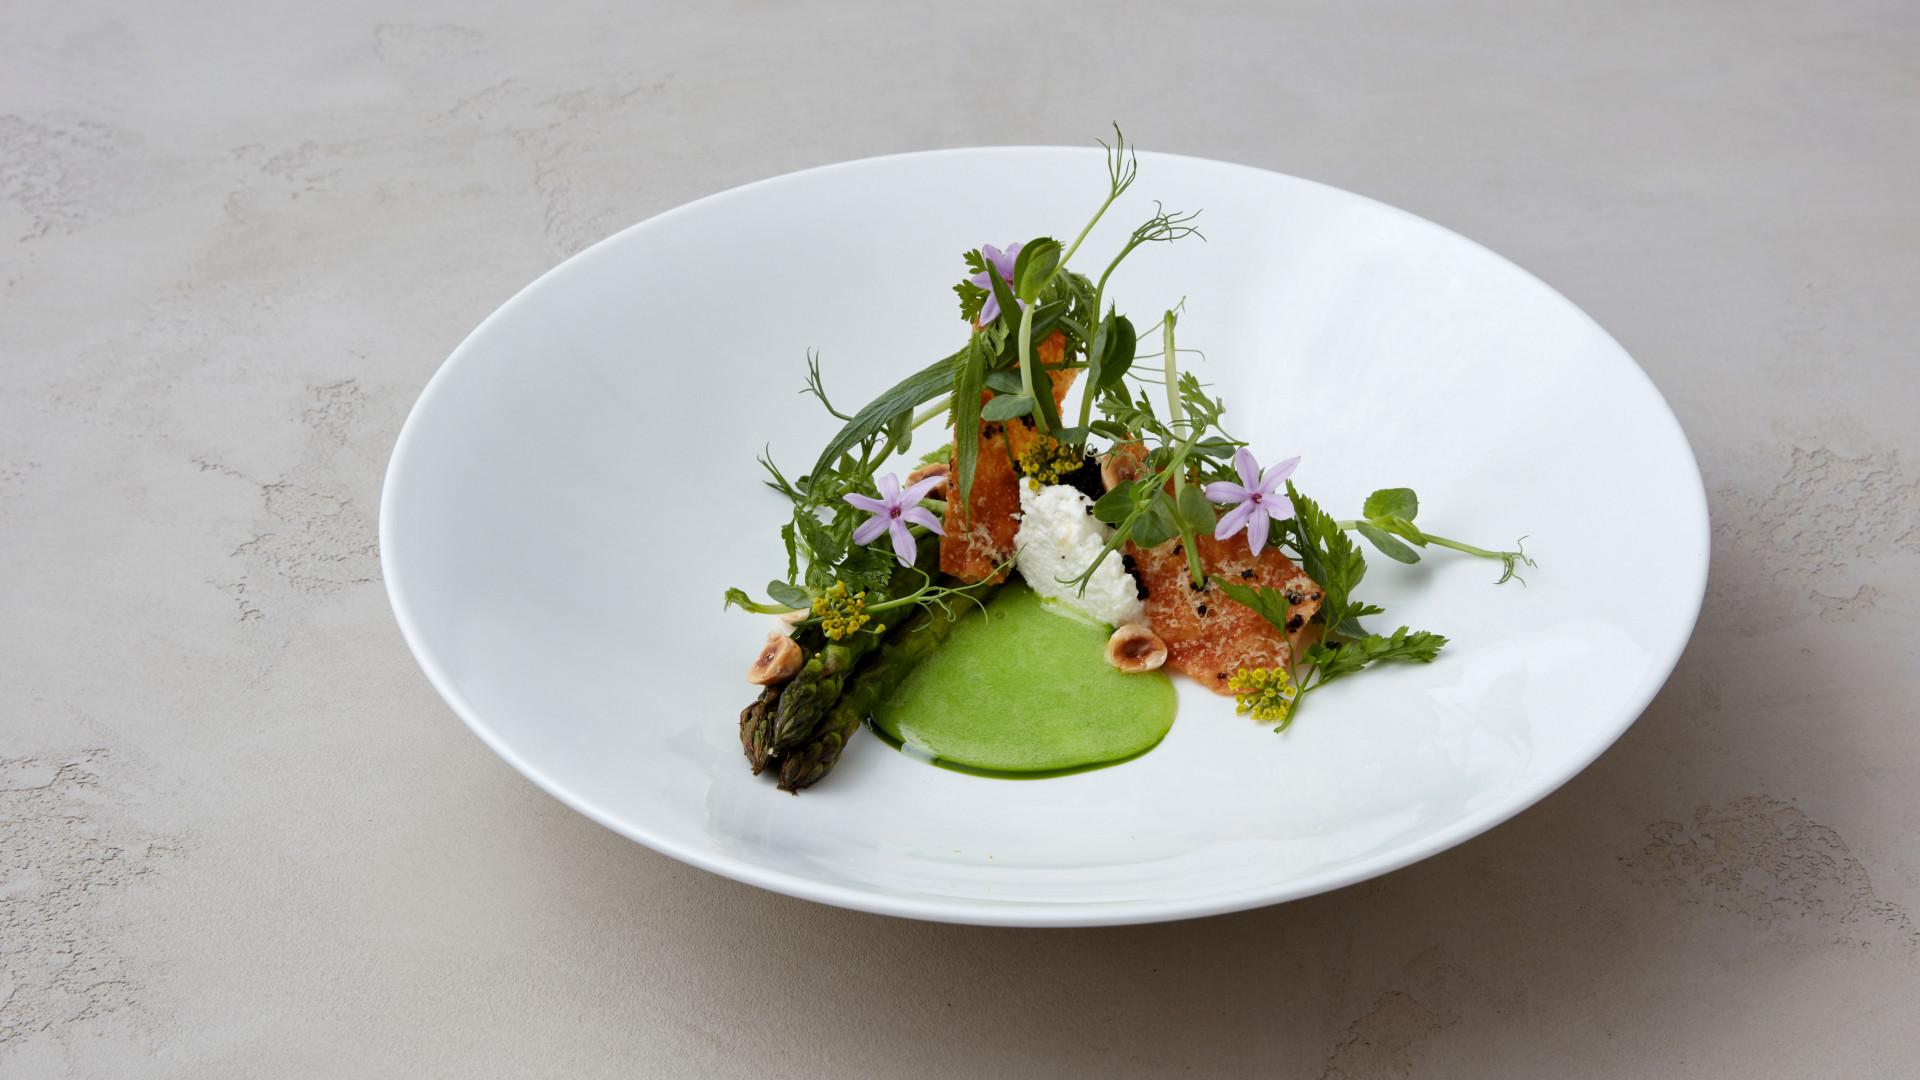 Asparagus, this morning's ricotta, chervil